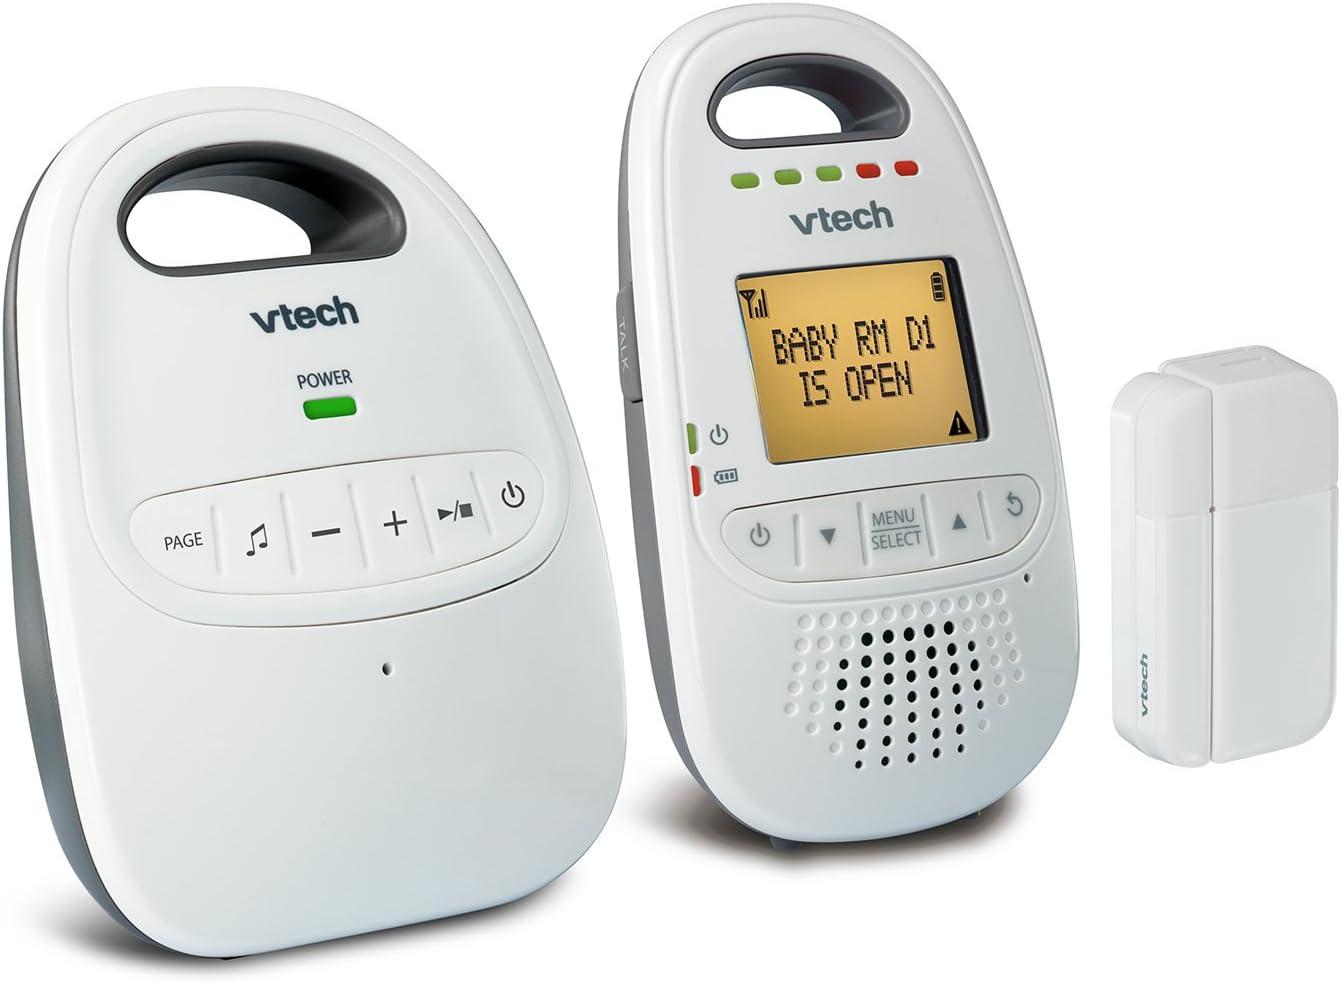 VTech DM251-102 Audio Baby Monitor with Open or Closed Door/Window Sensor, 1,000 ft of Range, 5-Level Sound Indicator, Digitized Transmission & Belt Clip